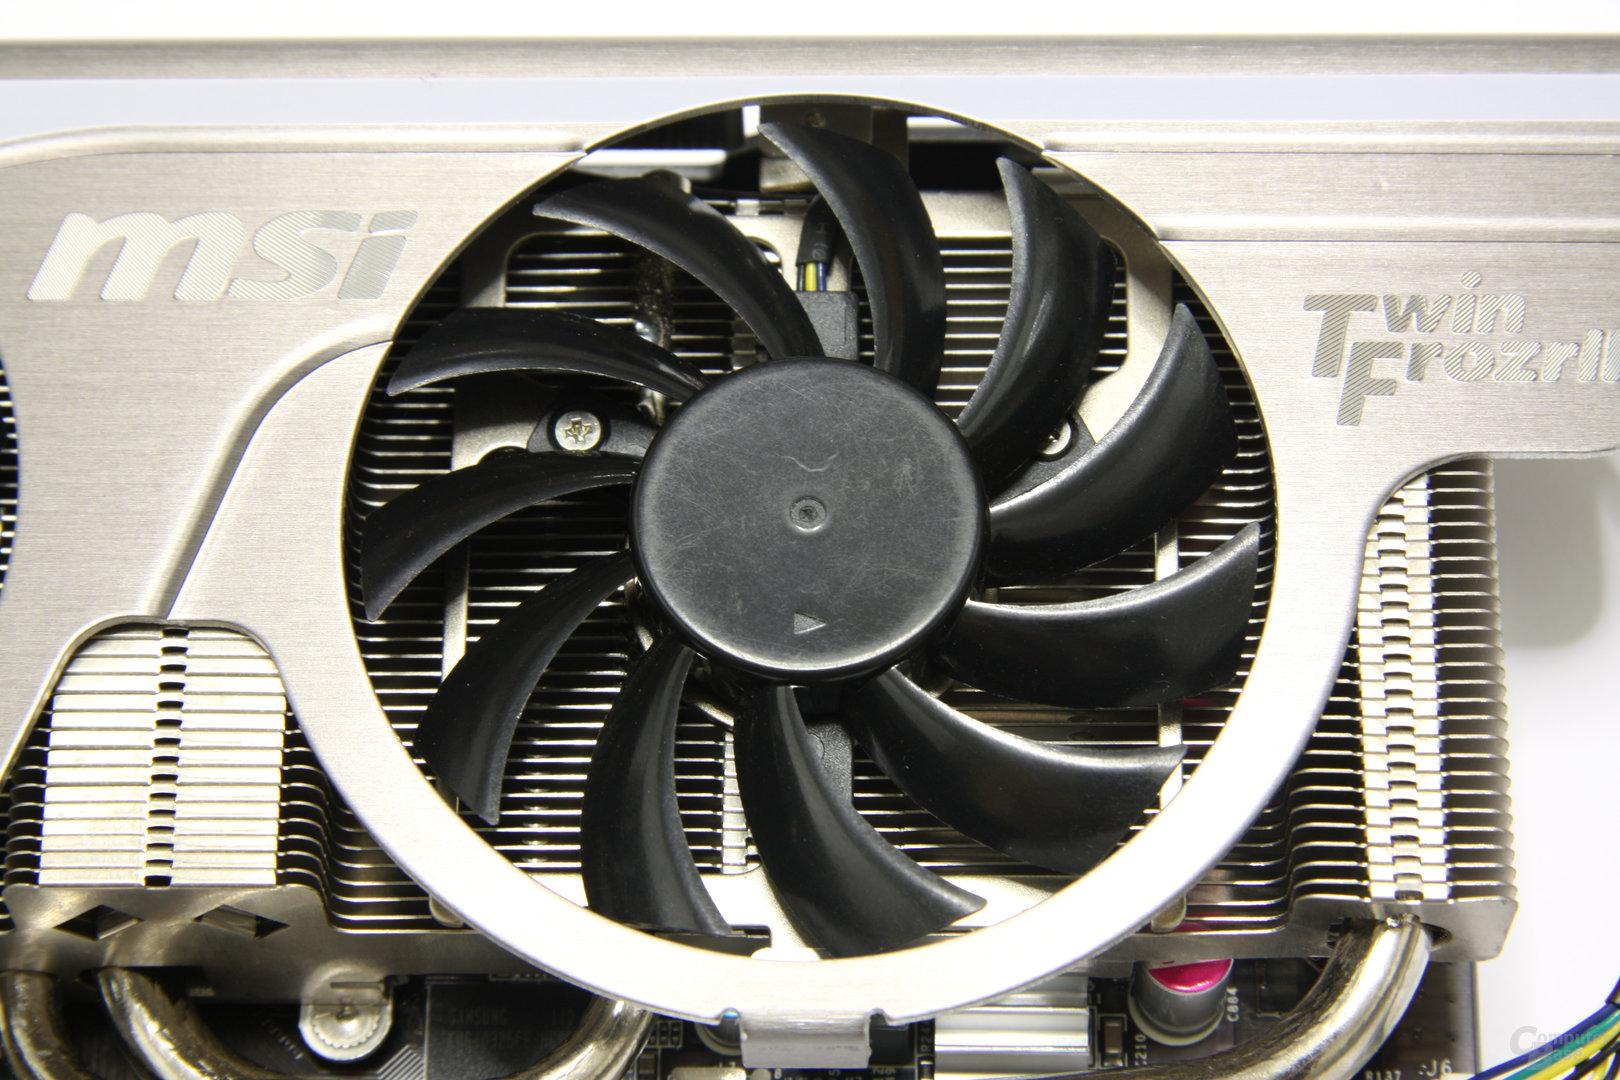 GeForce GTX 560 Twin Frozr II OC Lüfter